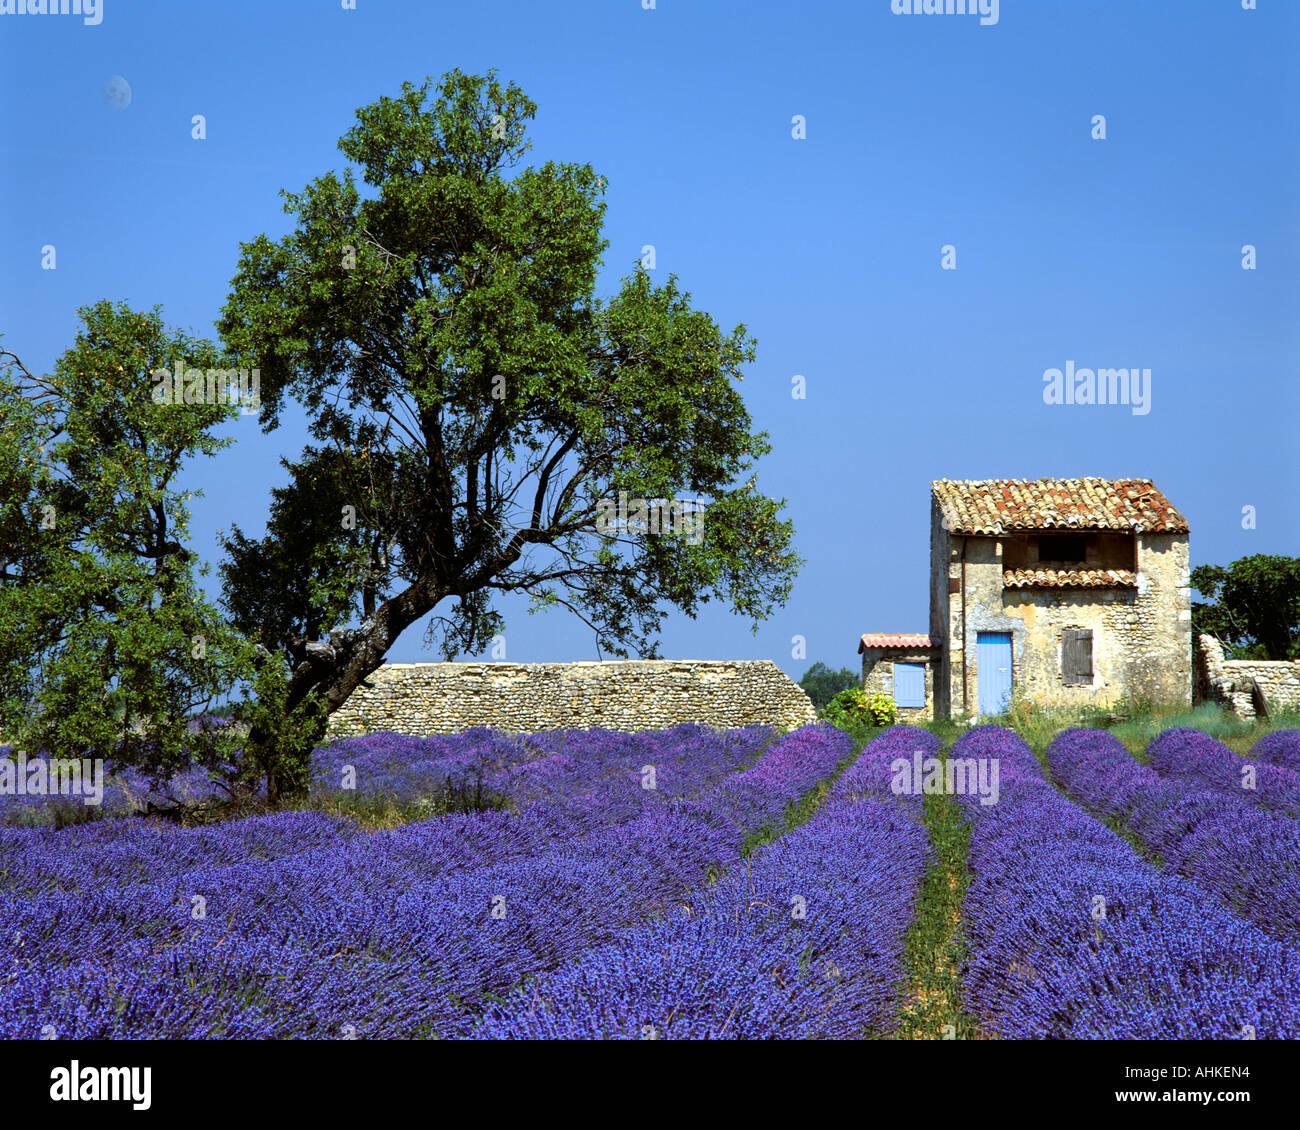 FR - ALPES-DE-HAUTE-PROVENCE:  Lavender Field on Plateau de Valensole near Puimoisson - Stock Image